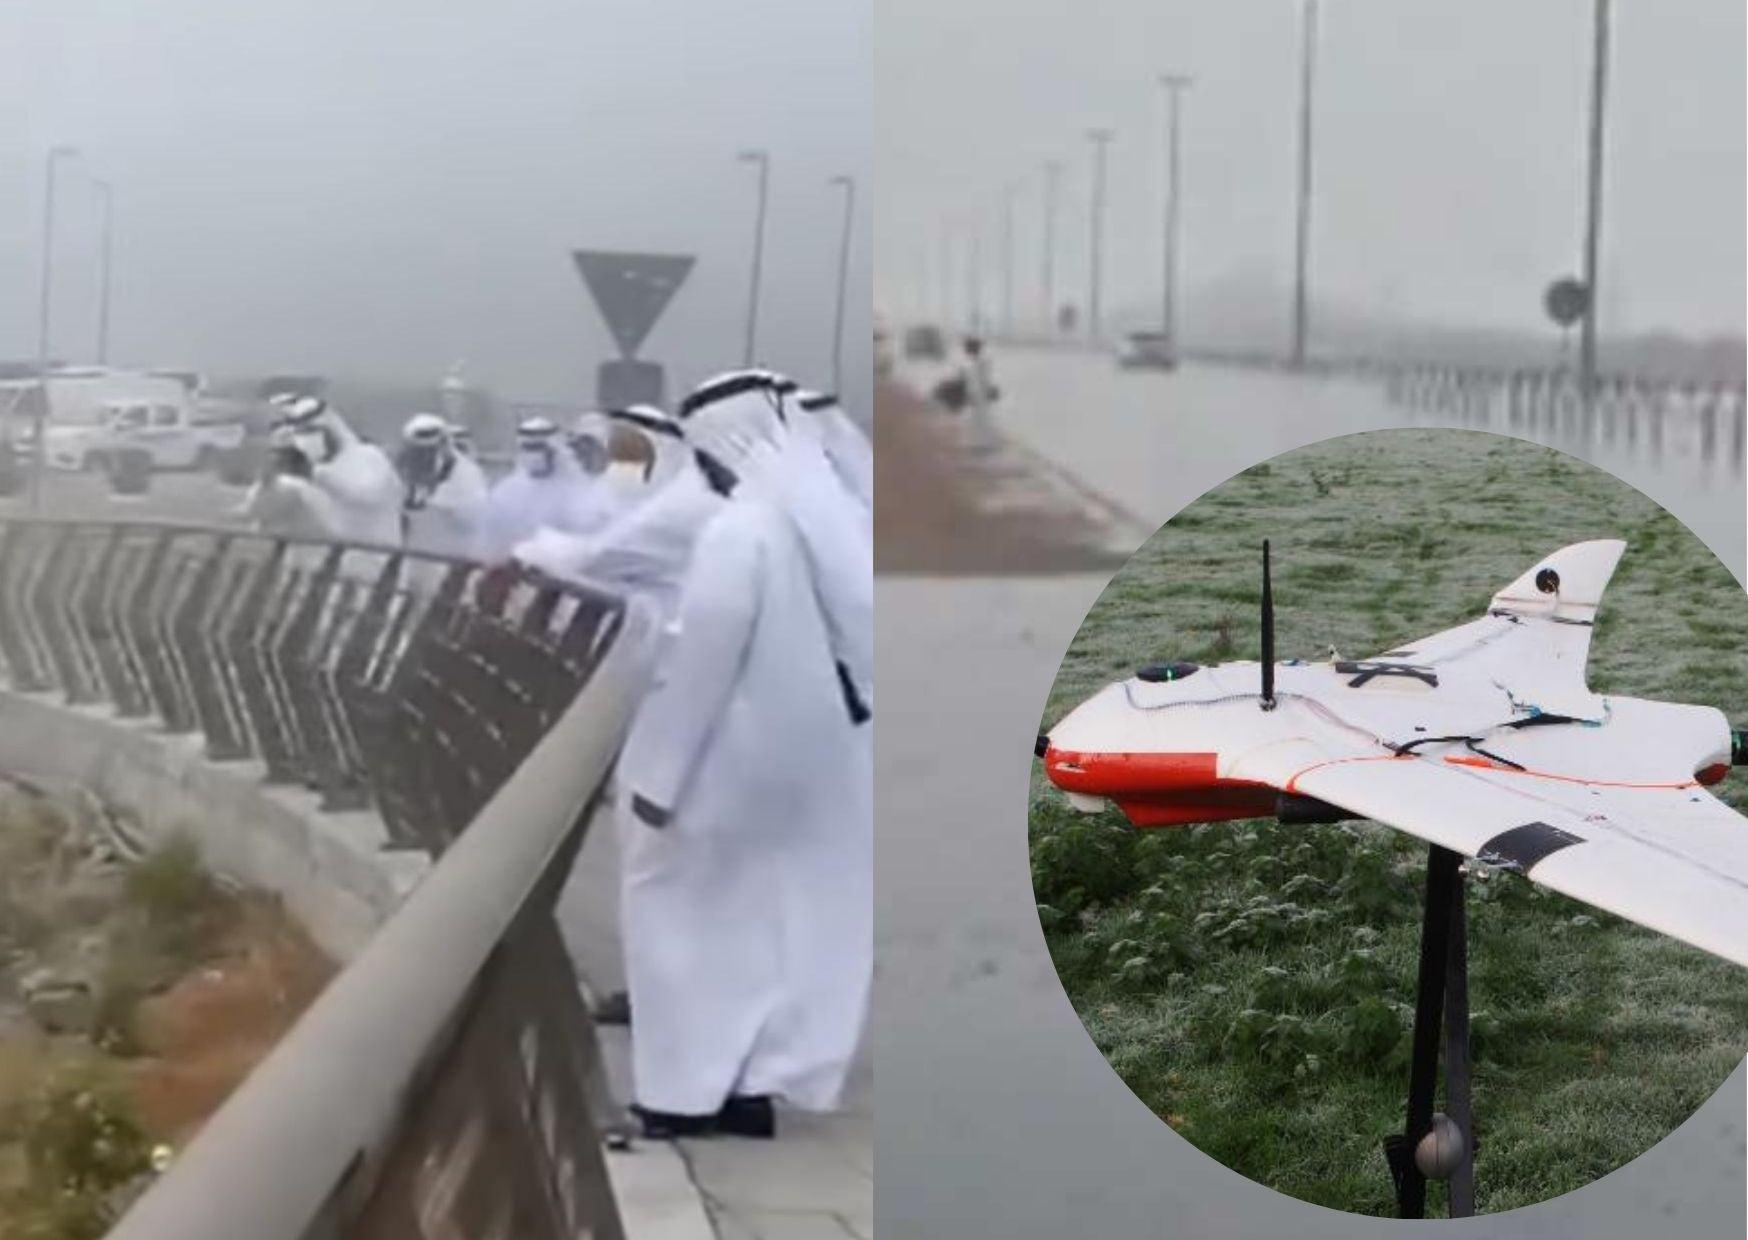 emiratos árabes lluvia artificial